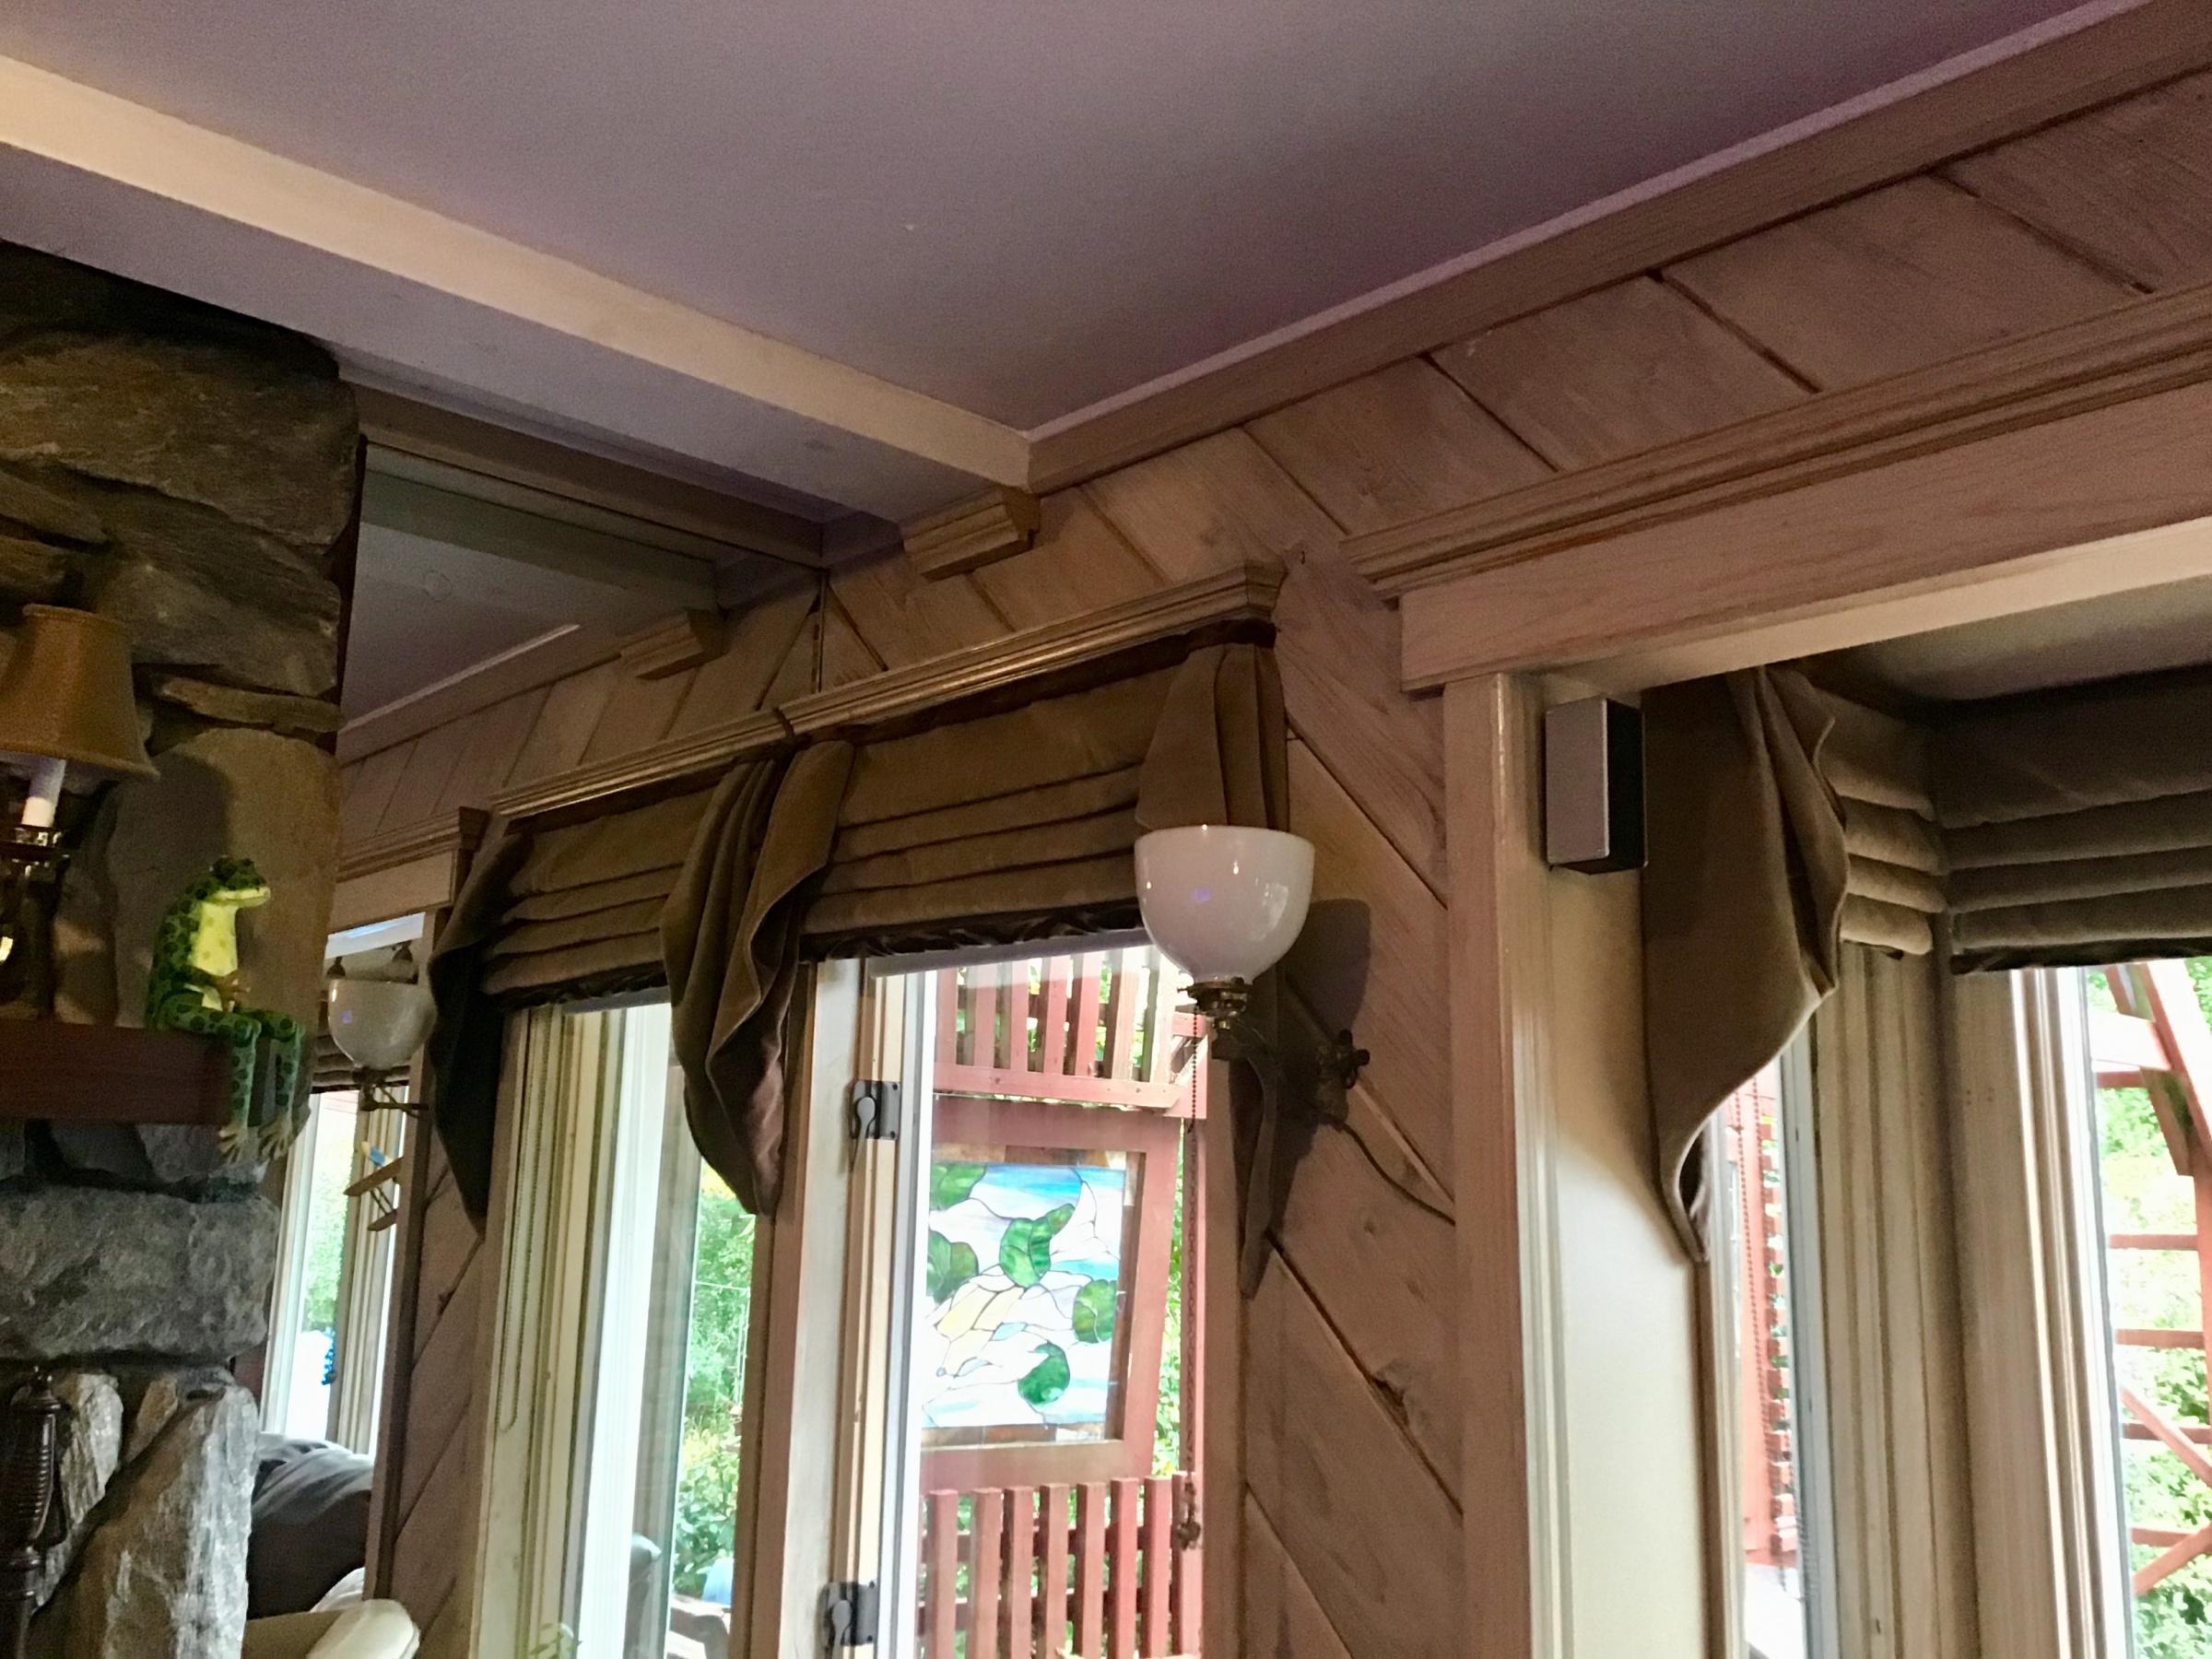 Curtain ideas for these old wood headers ?-973f25d8-6feb-4b16-8d88-41b1c975b85d.jpg